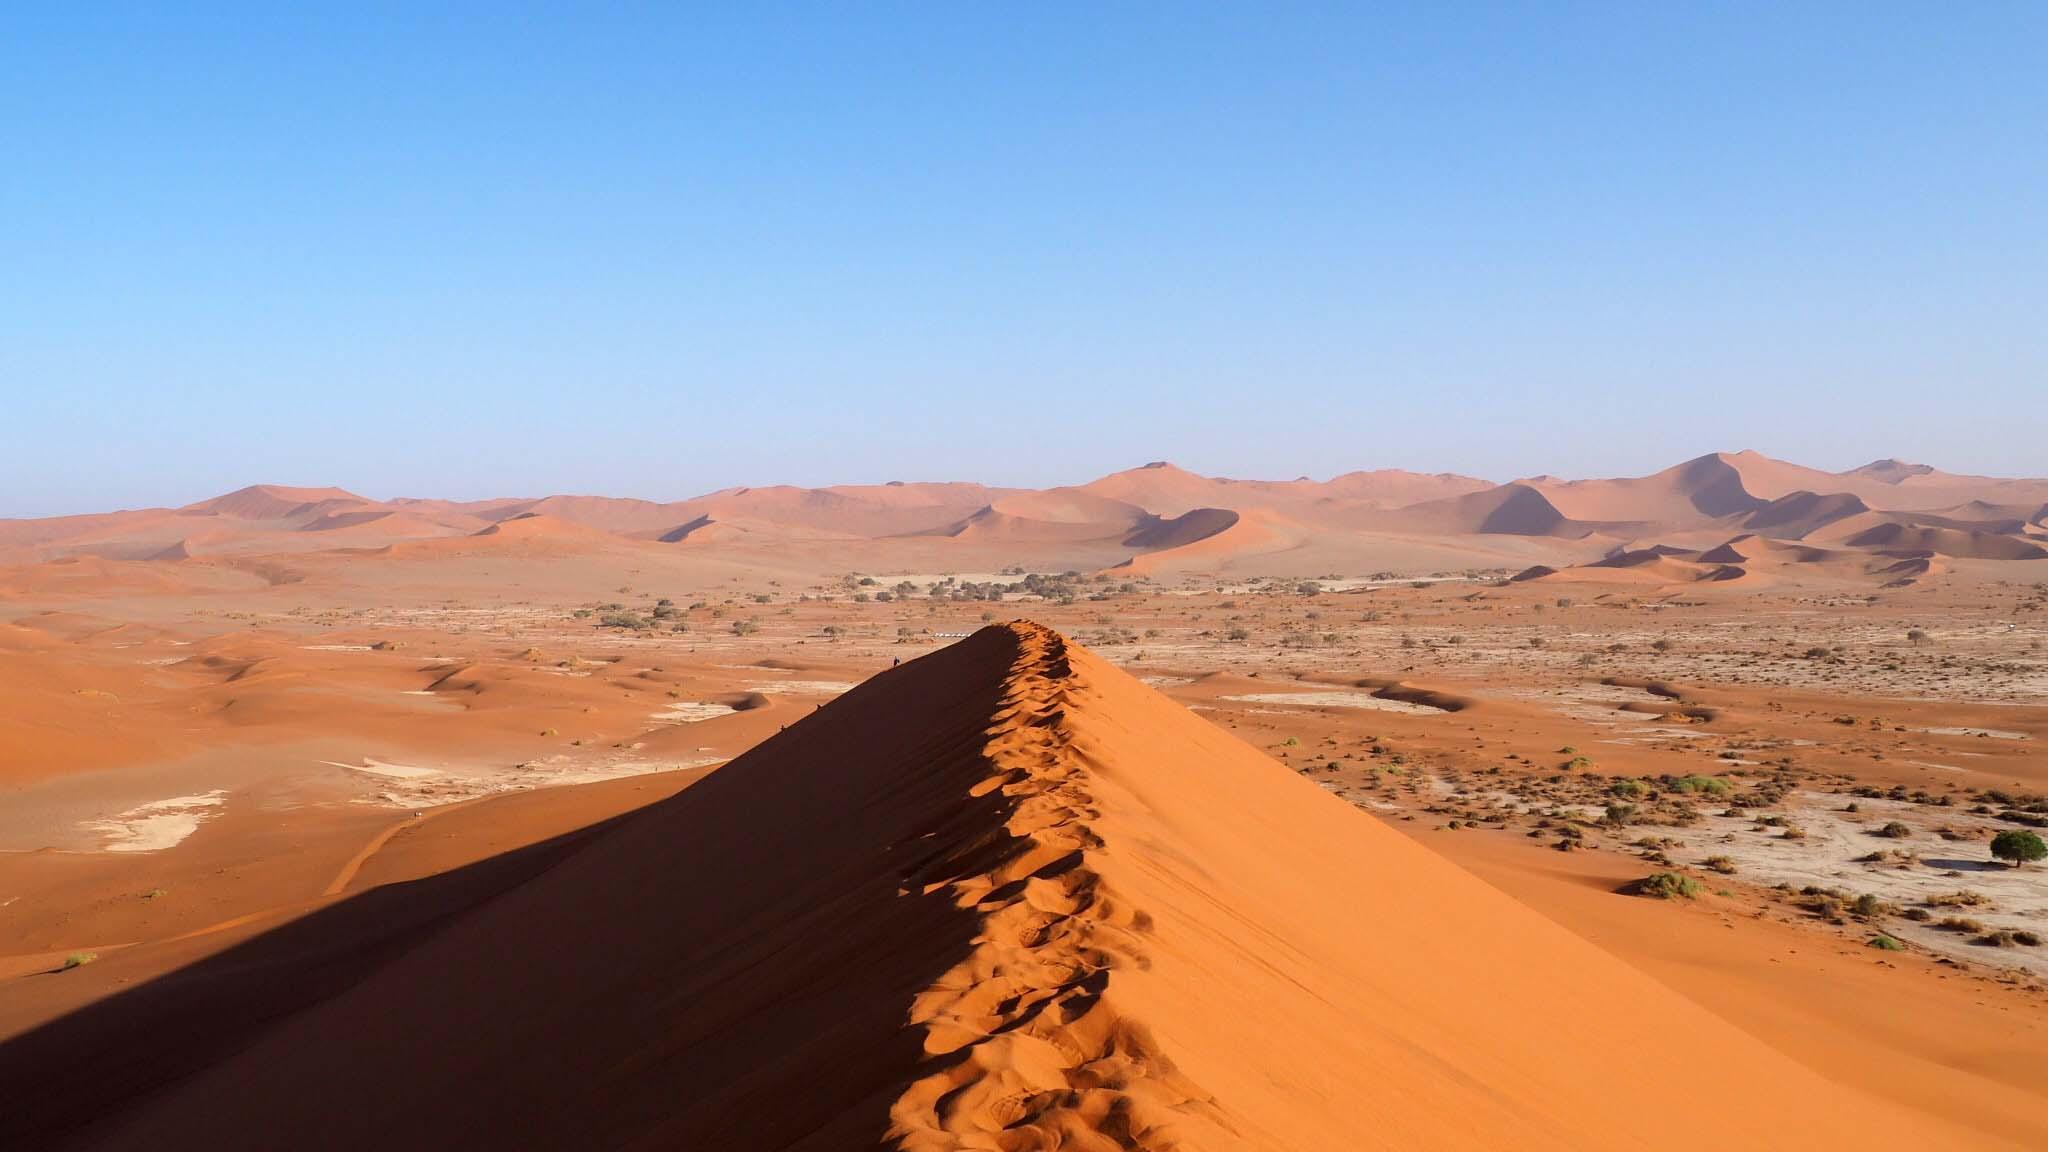 Dune de Sossuvlei - Namibie